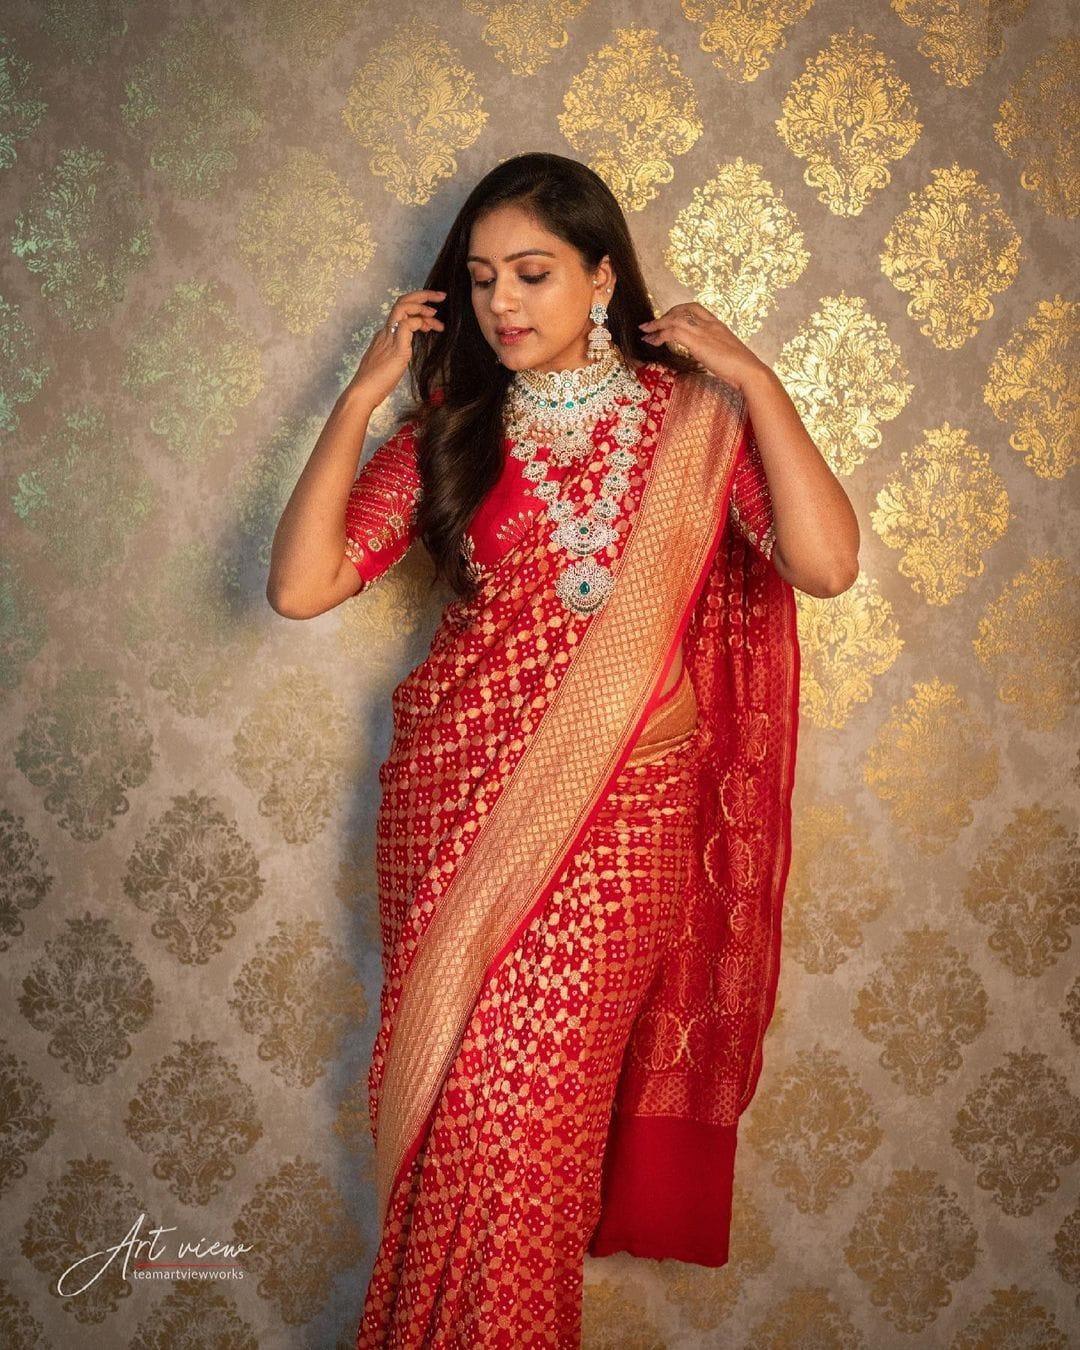 Beautiful Vithika Sheru in red benarsi saree. Saree : Sri Krishna Silks. Jewellery   : Manepally Jewellers. PC- Art view works. 2021-04-18